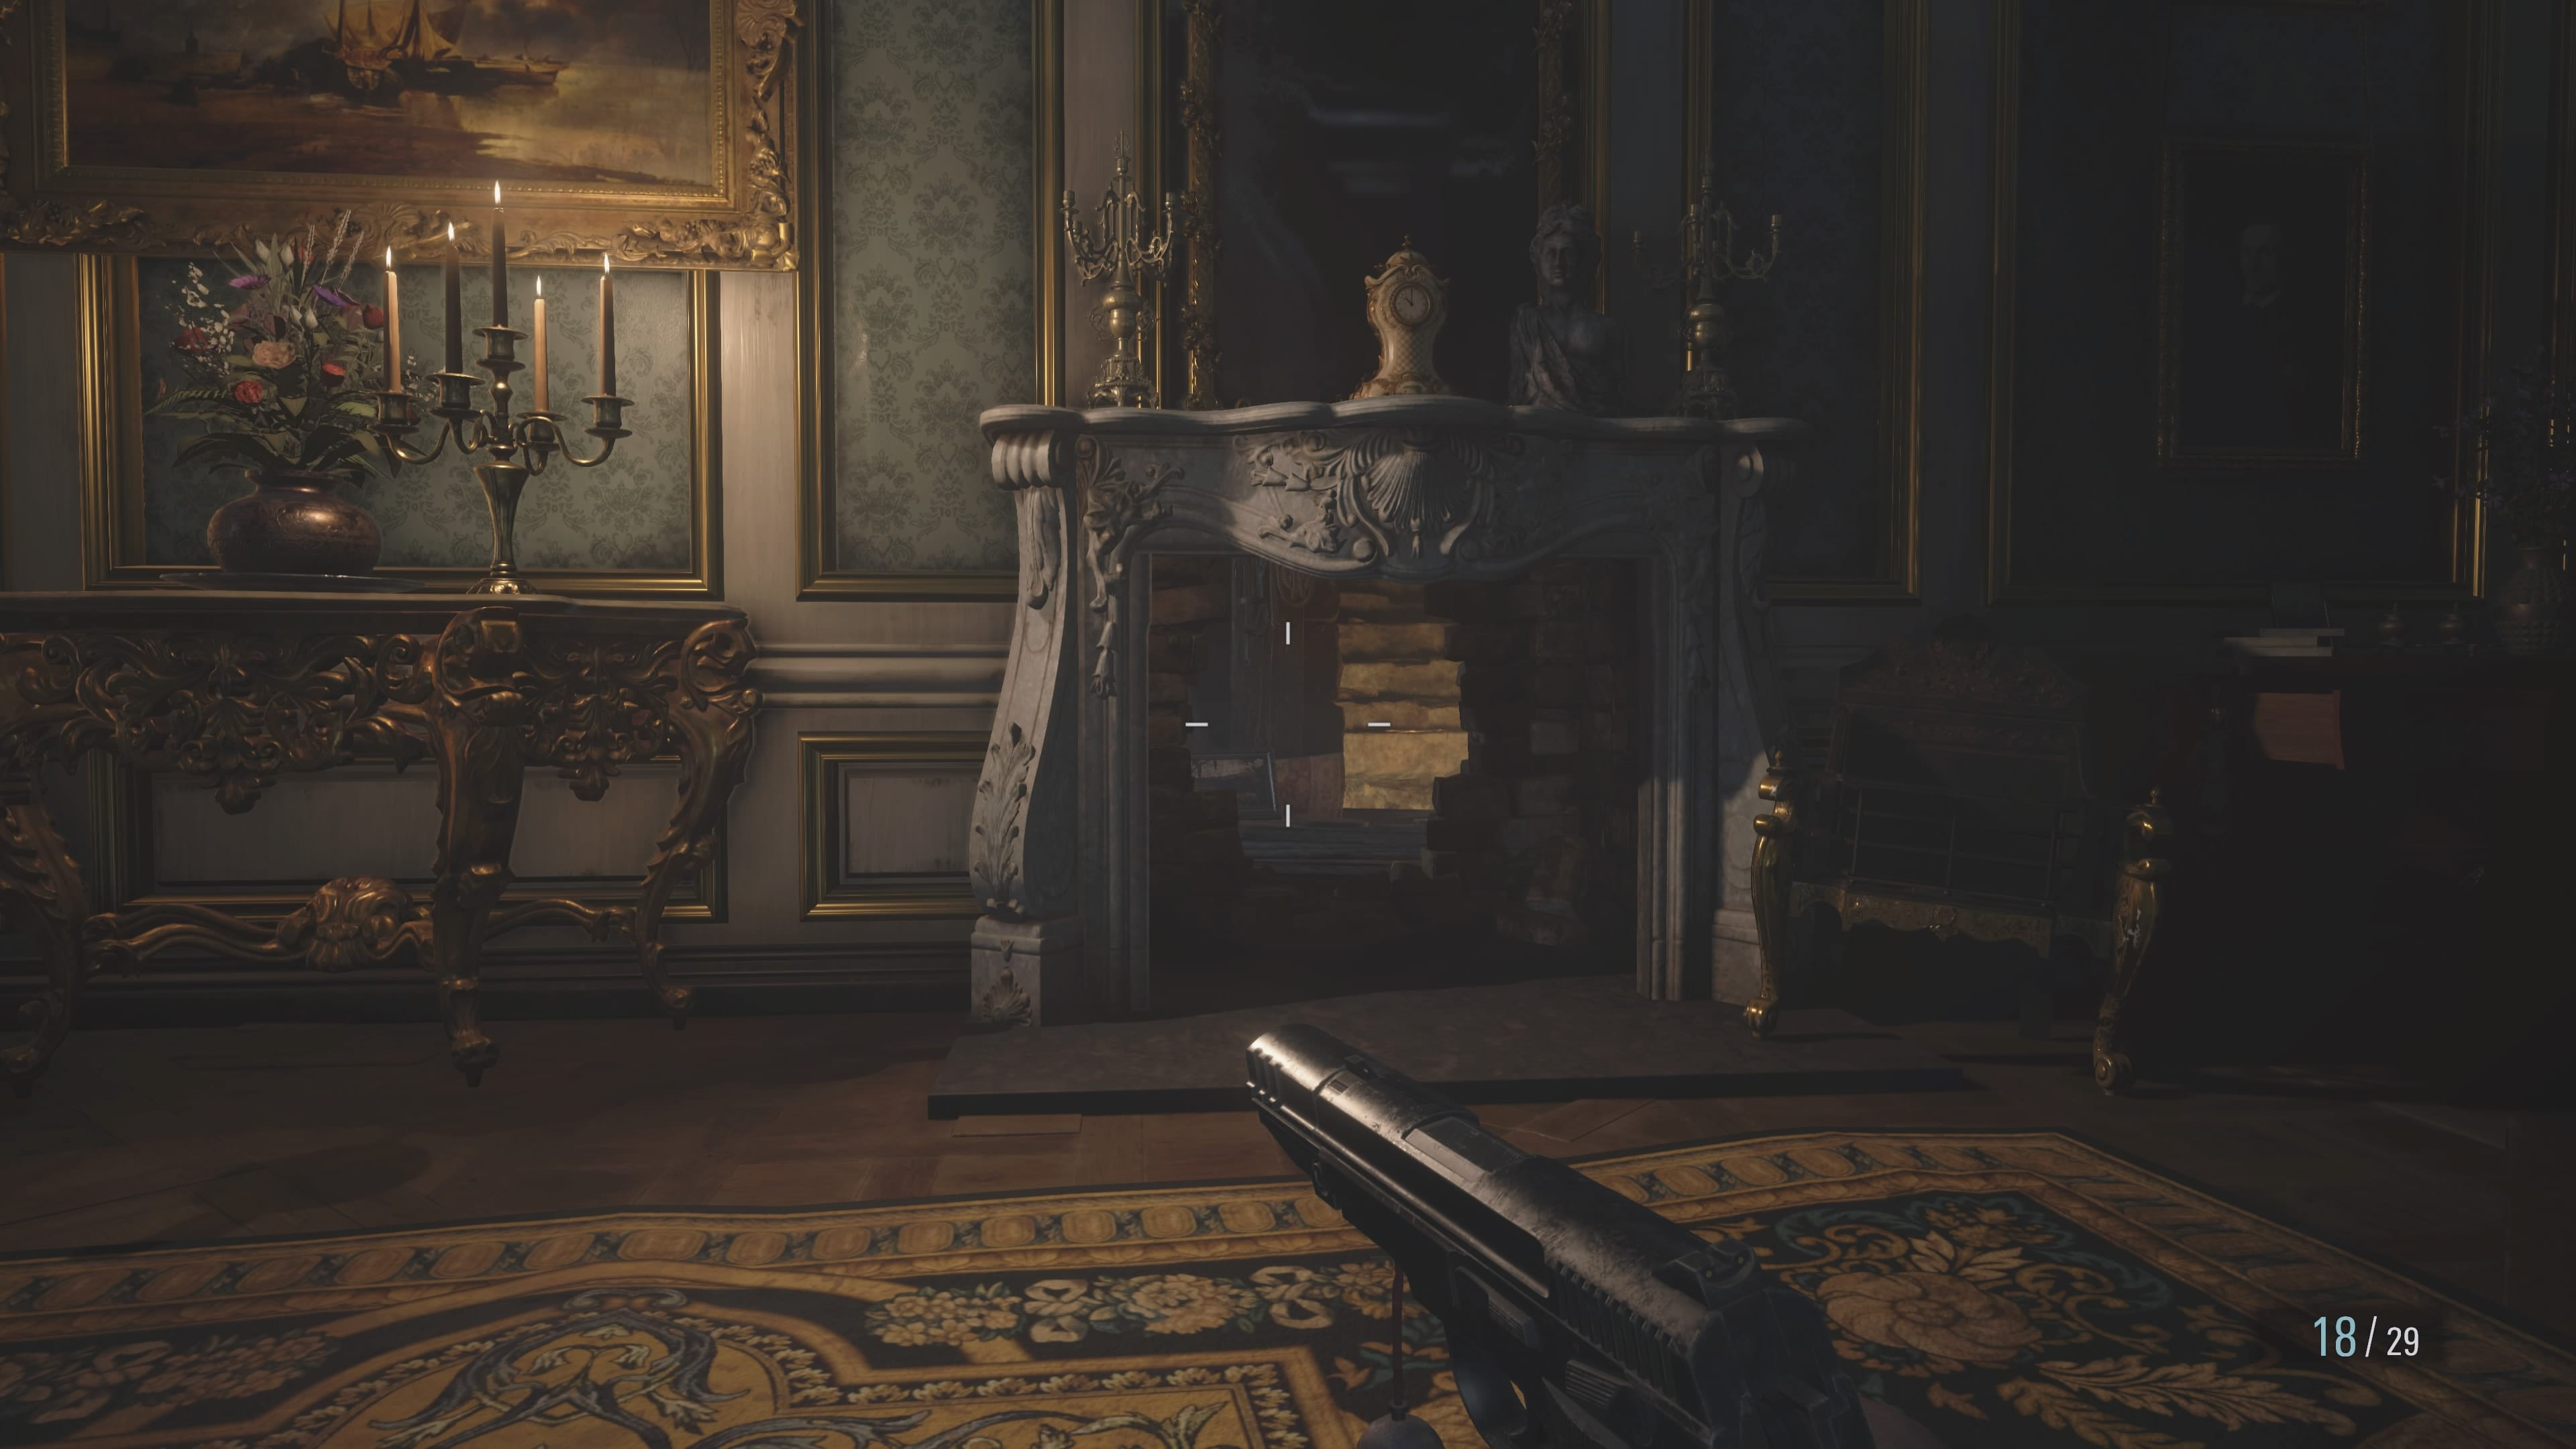 Resident Evil 8: Geheimgang, Halle der Verzückung (Resident Evil 8 Lösung)